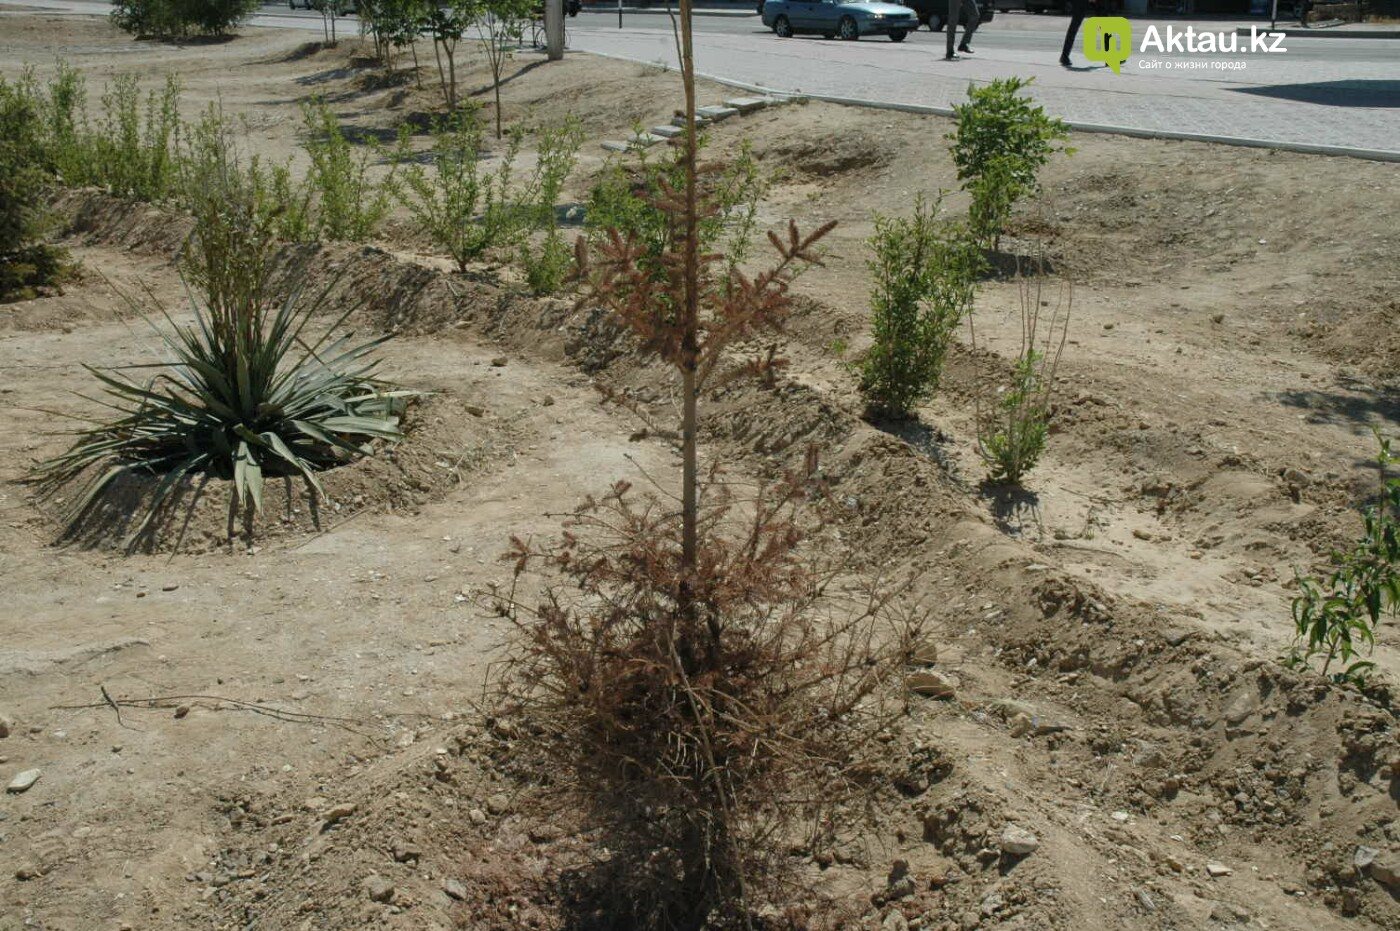 Погибшие от засухи и обезвоживания в Актау исчисляются десятками (ФОТО), фото-25